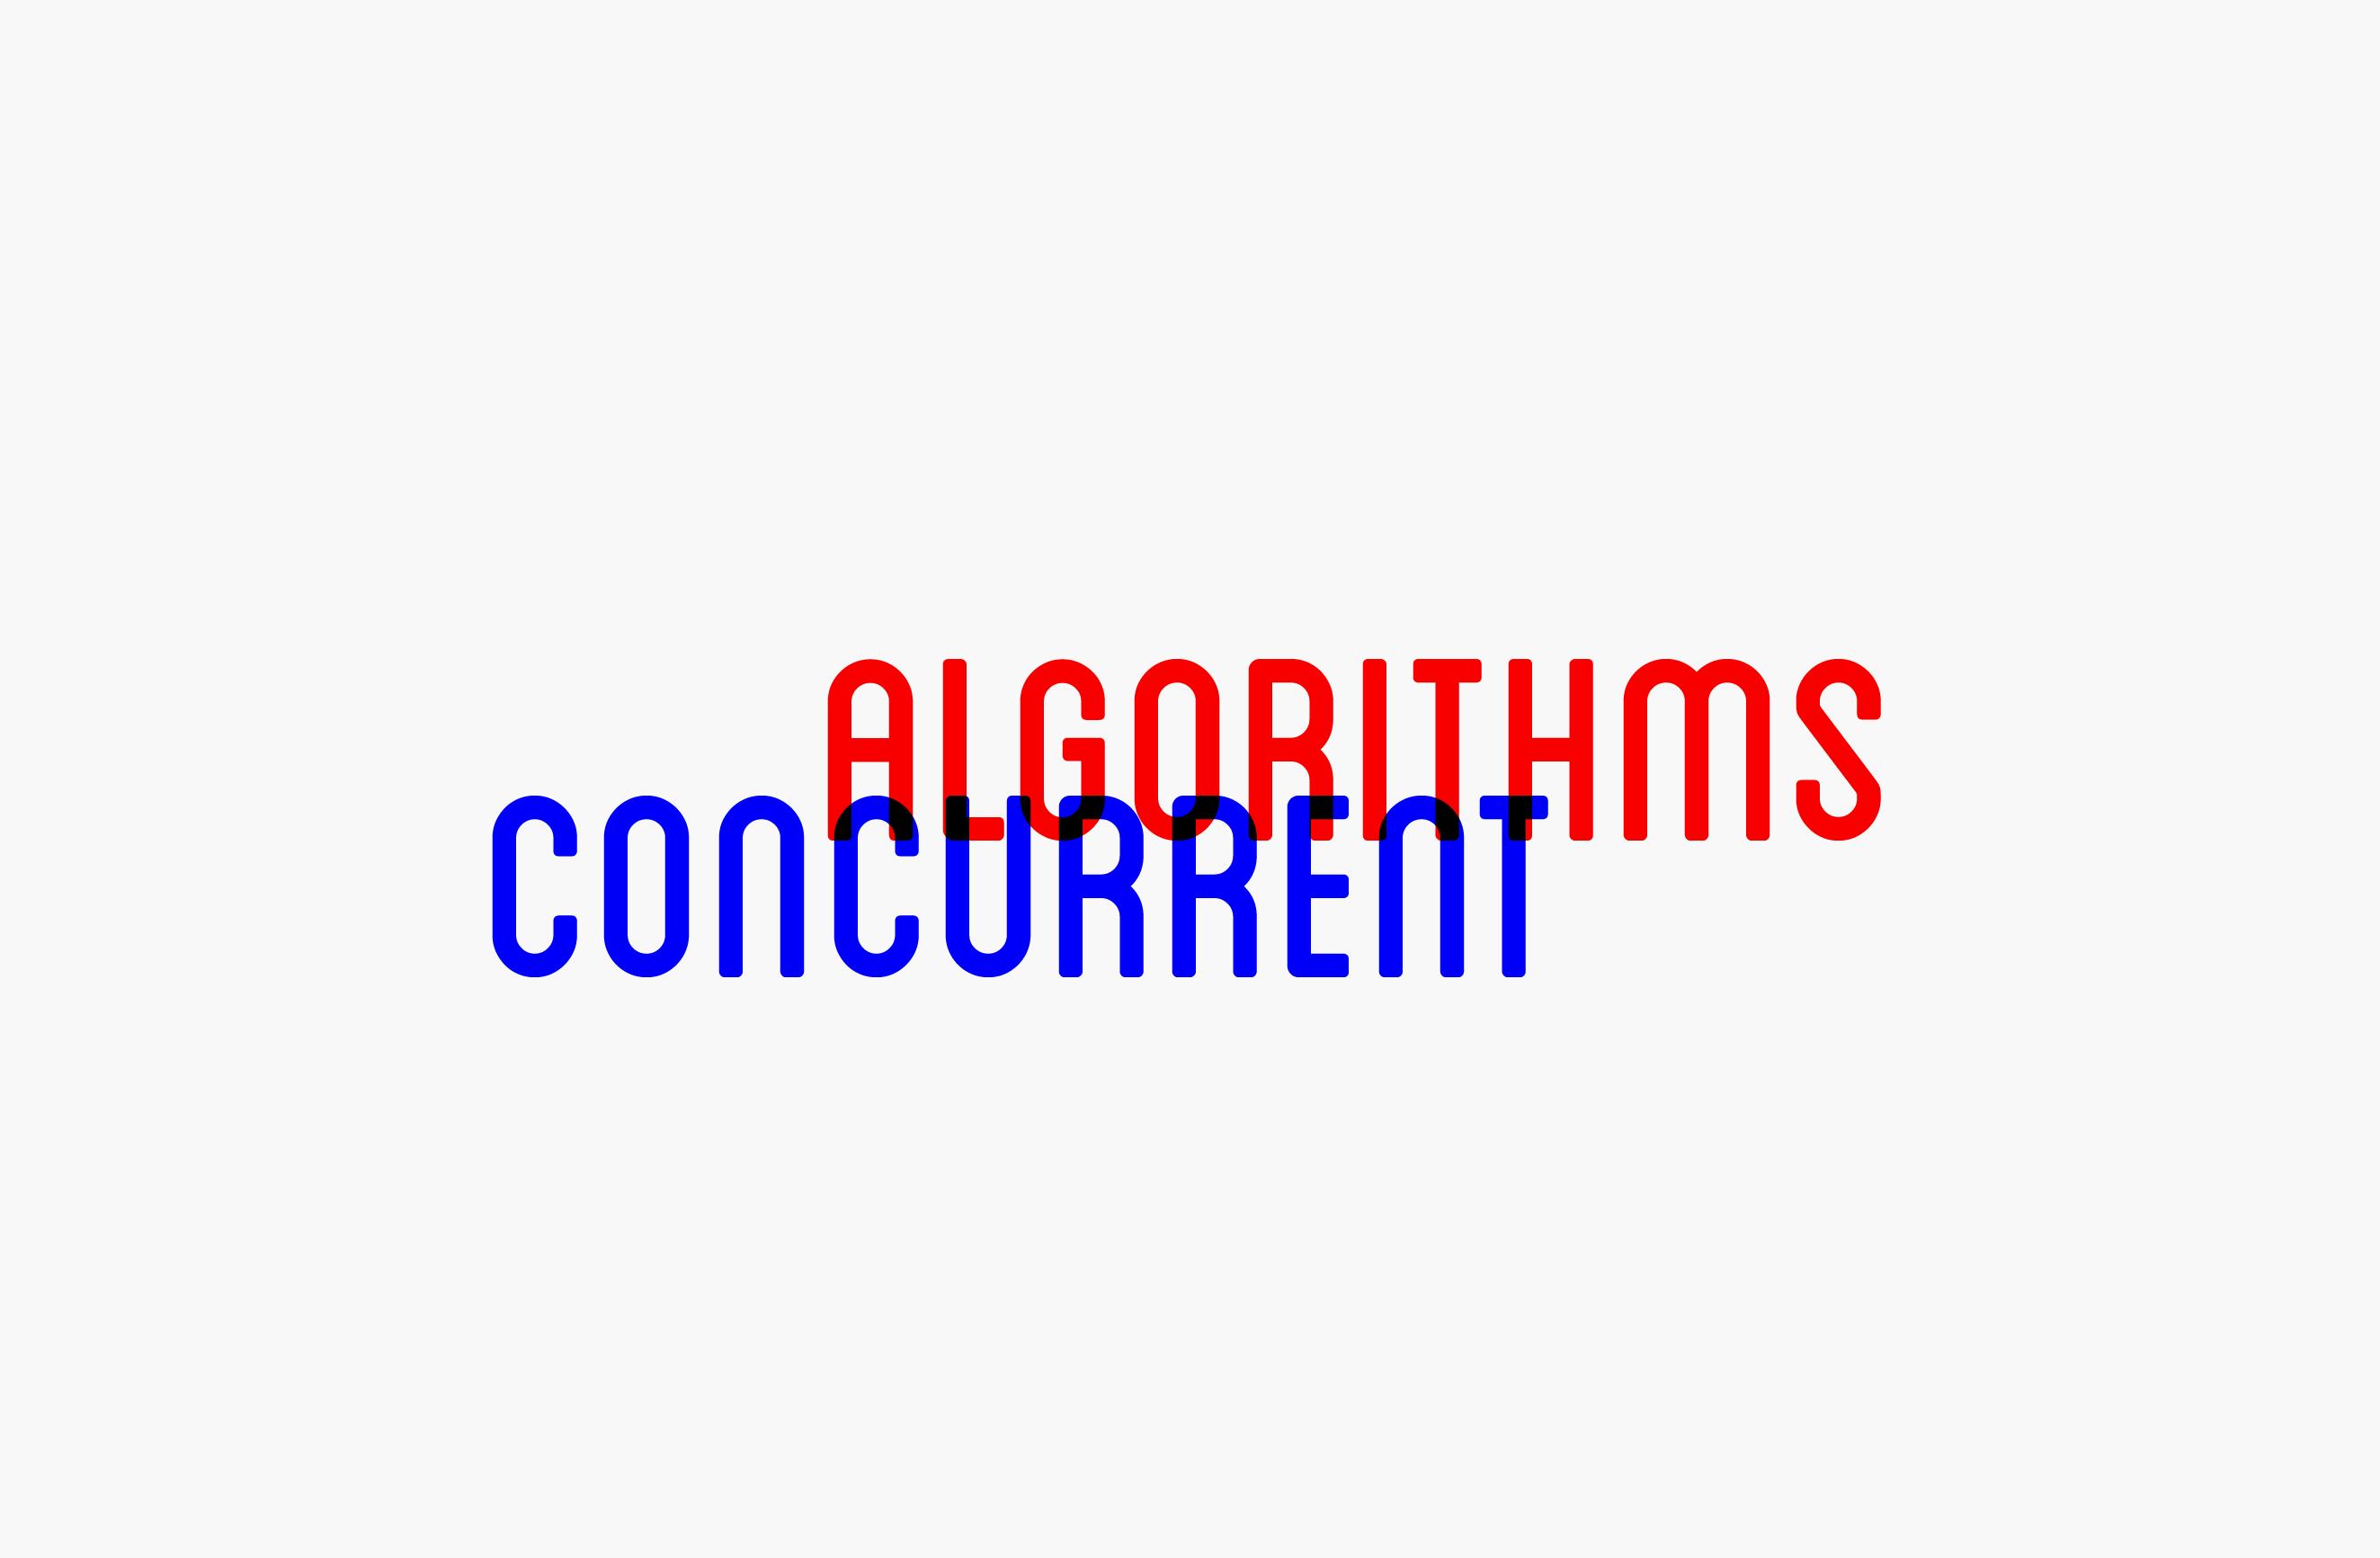 Concurrent Algorithms Logo — by Yagnyuk.